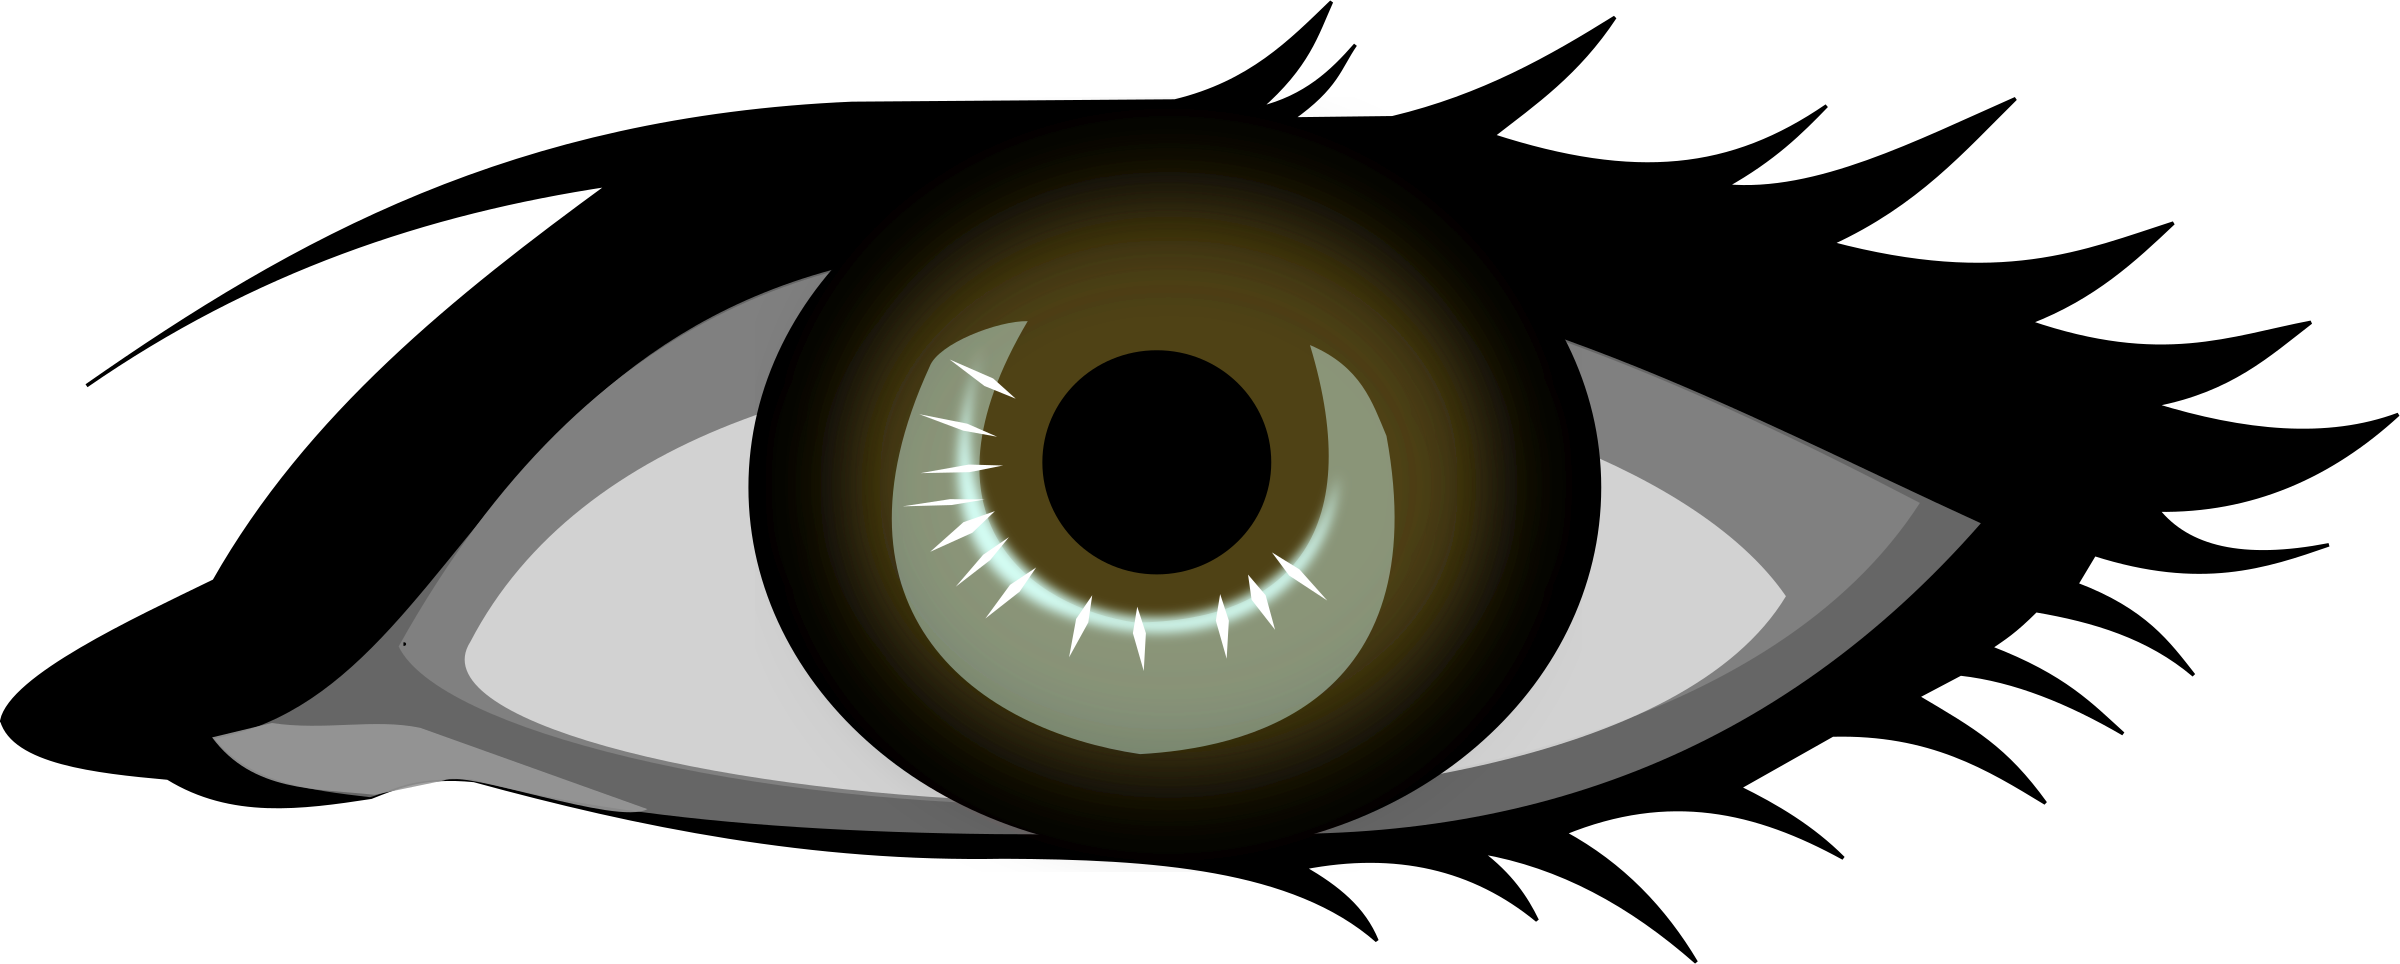 Eyeball clipart third eye. Clip art human cliparts